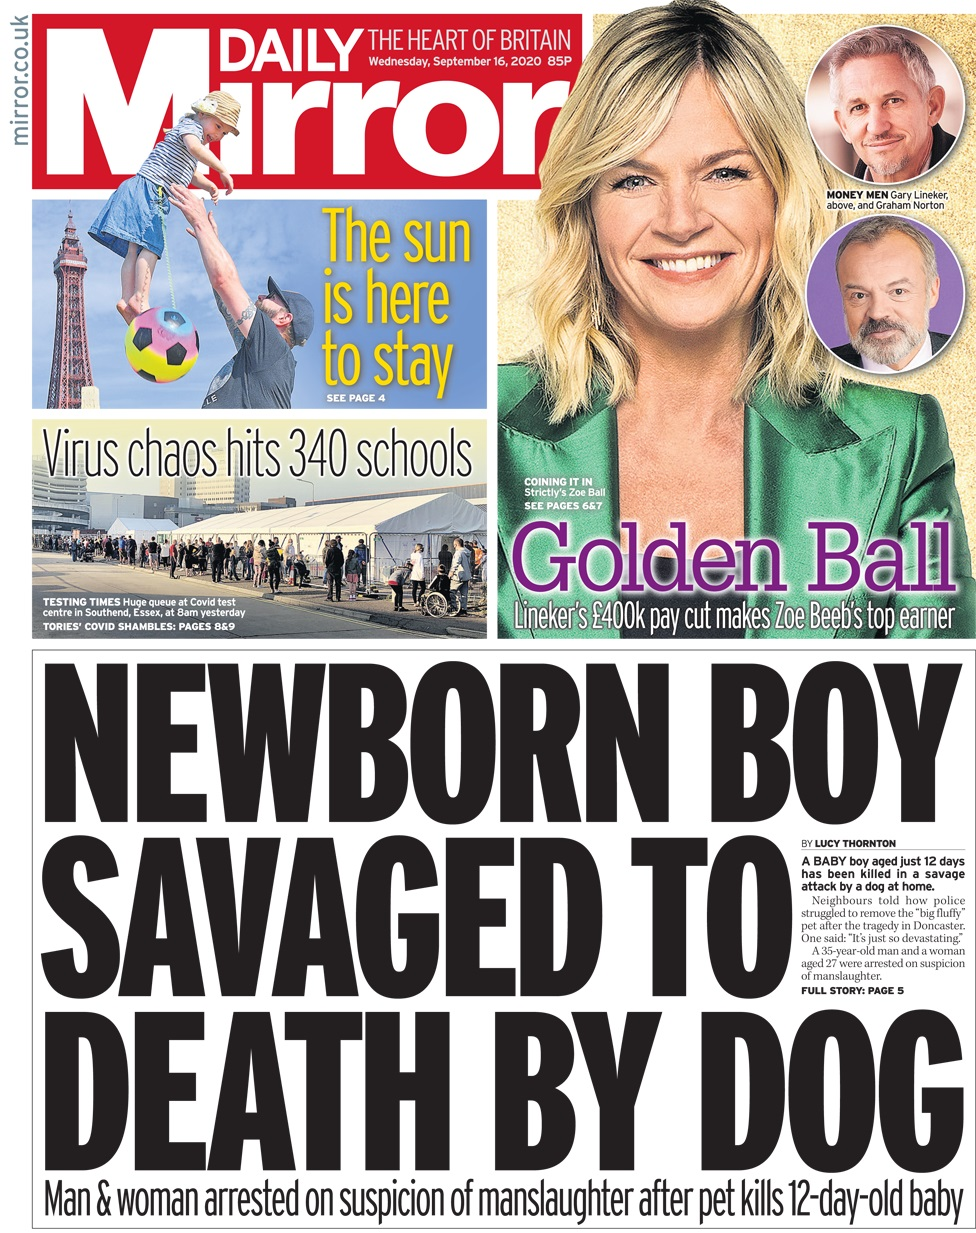 Daily Mirror 16 September